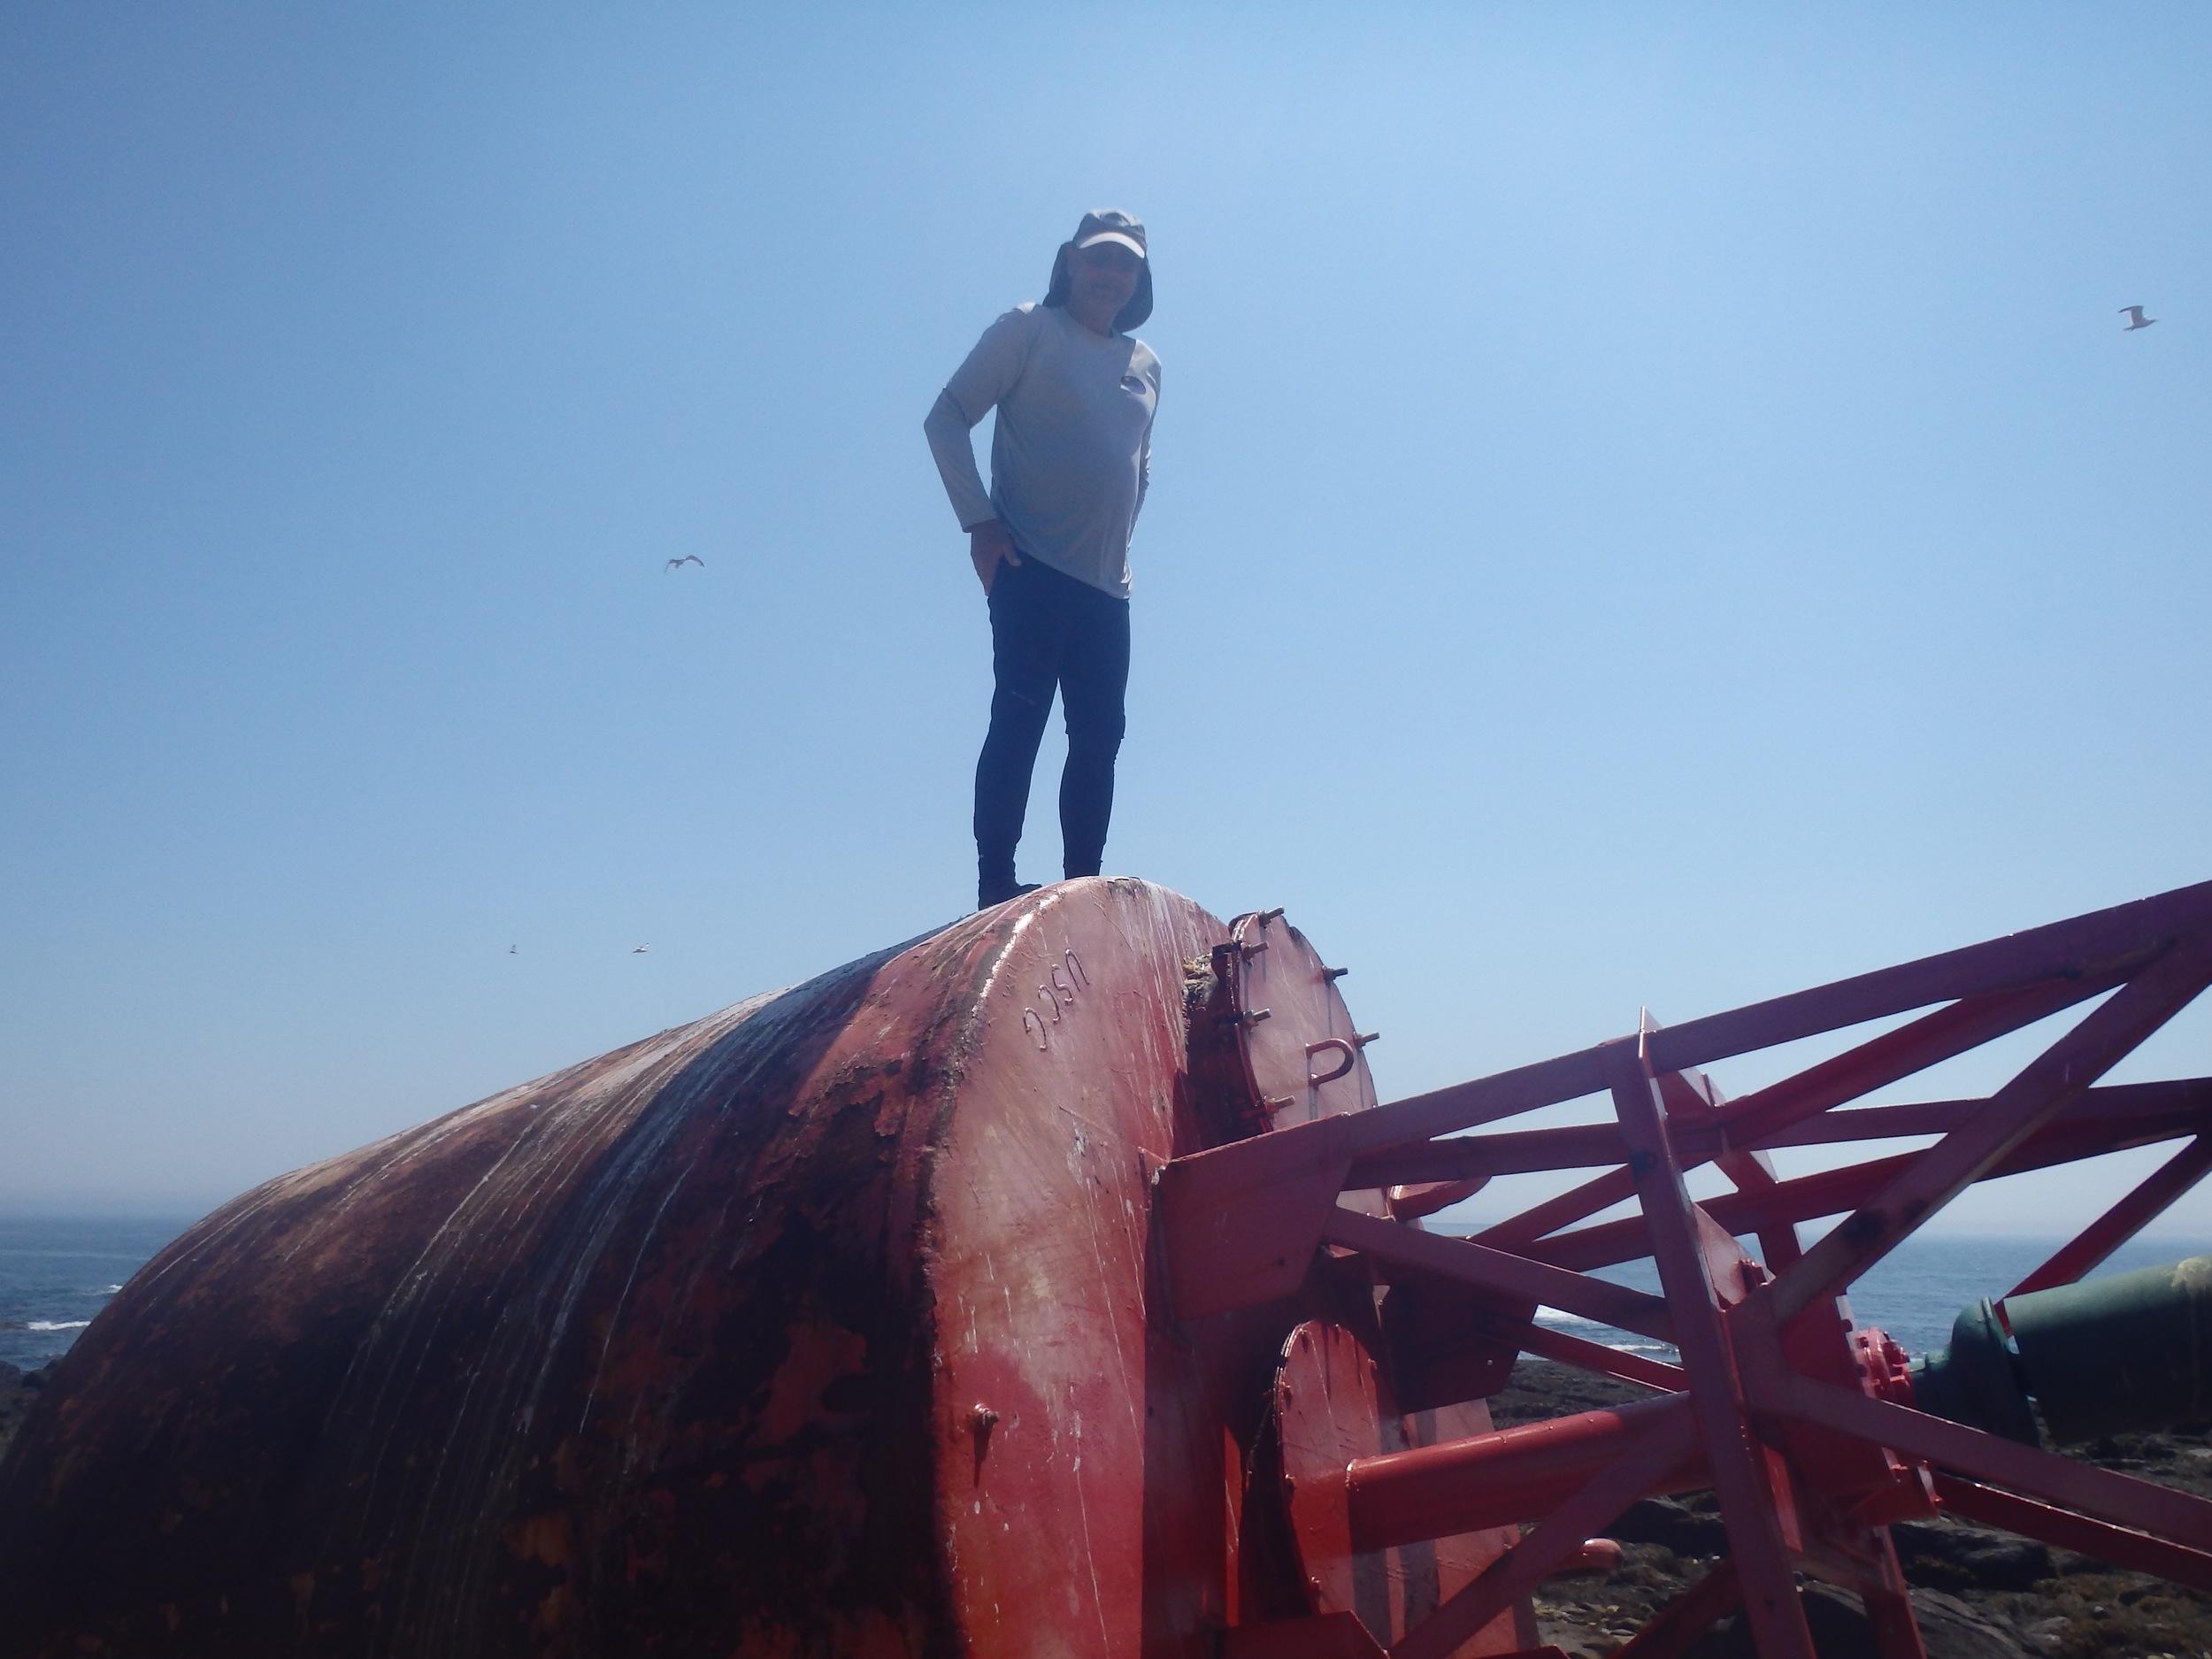 Josko on the buoy